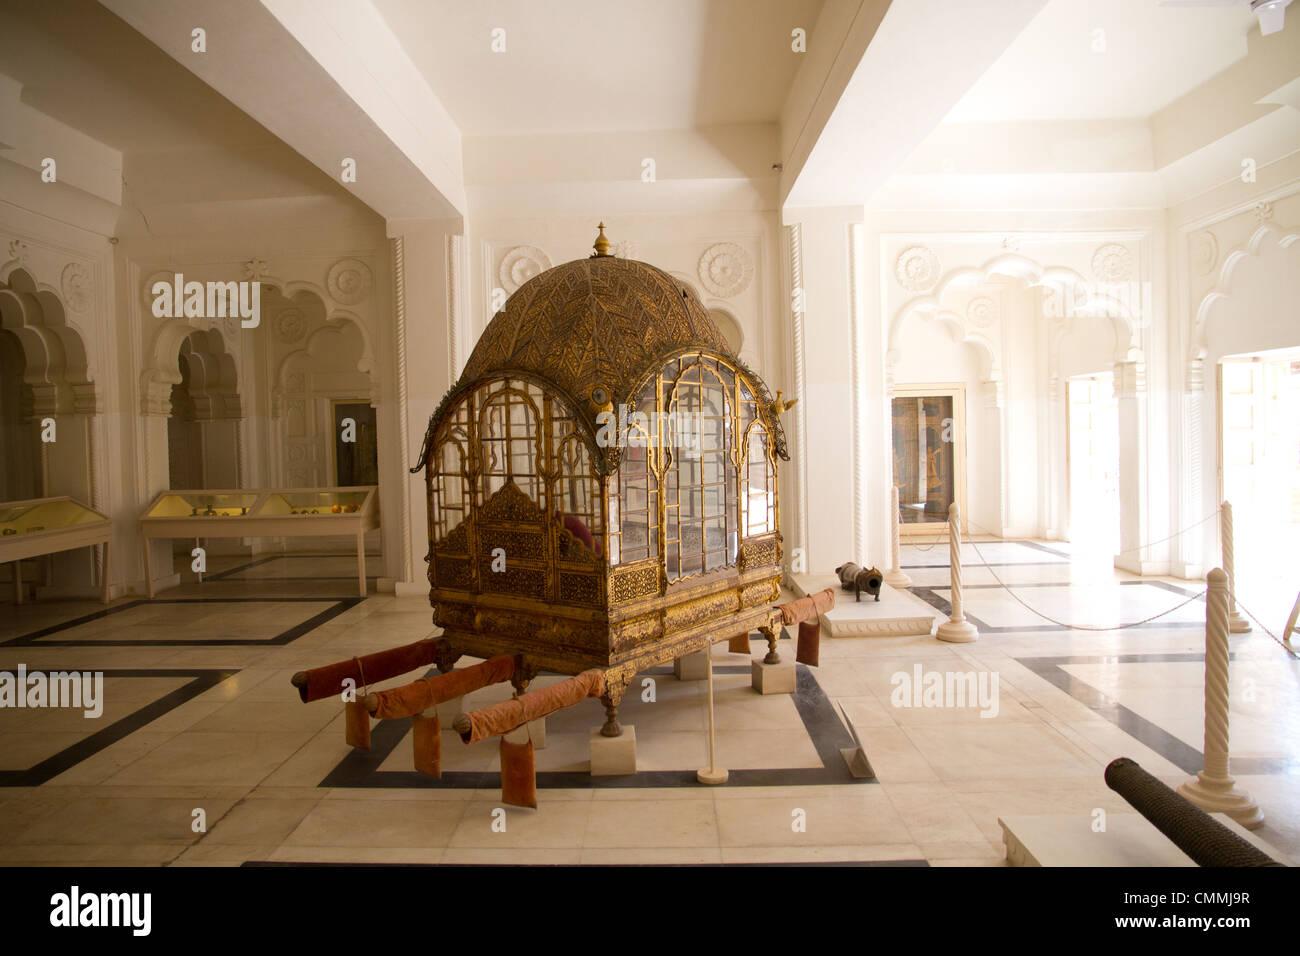 Doli (Wurf/Fahrzeug) auf dem Display, Mehrangarh Fort, Jodhpur, Rajasthan, Indien Stockbild